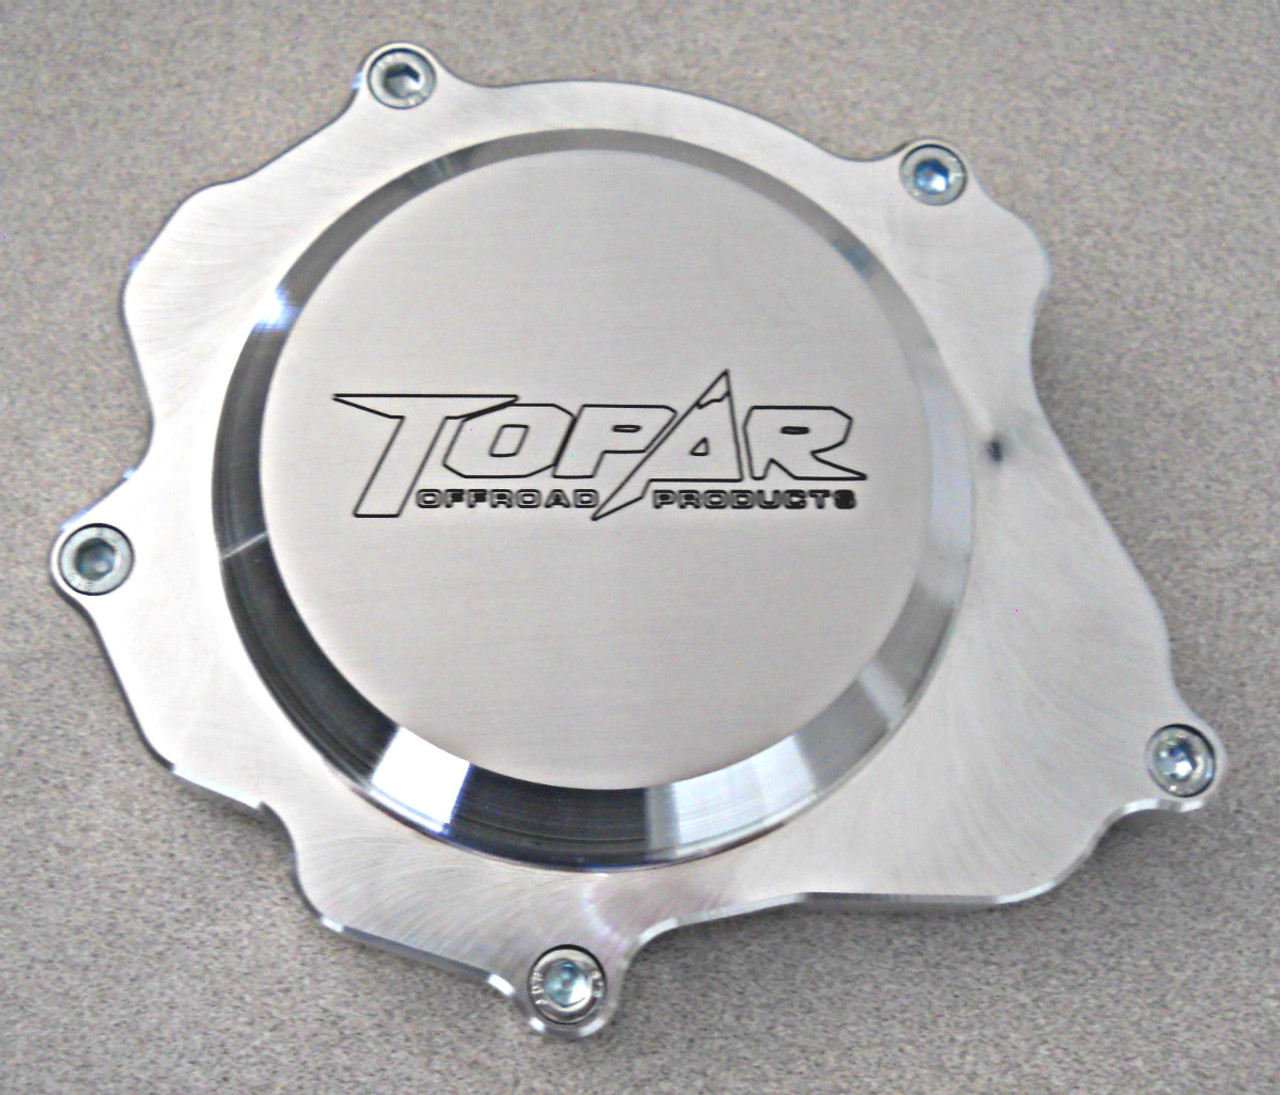 Topar Racing  Ignition Cover for 1990-2004 KAWASAKI KX250 Billet Aluminum  KXI-001